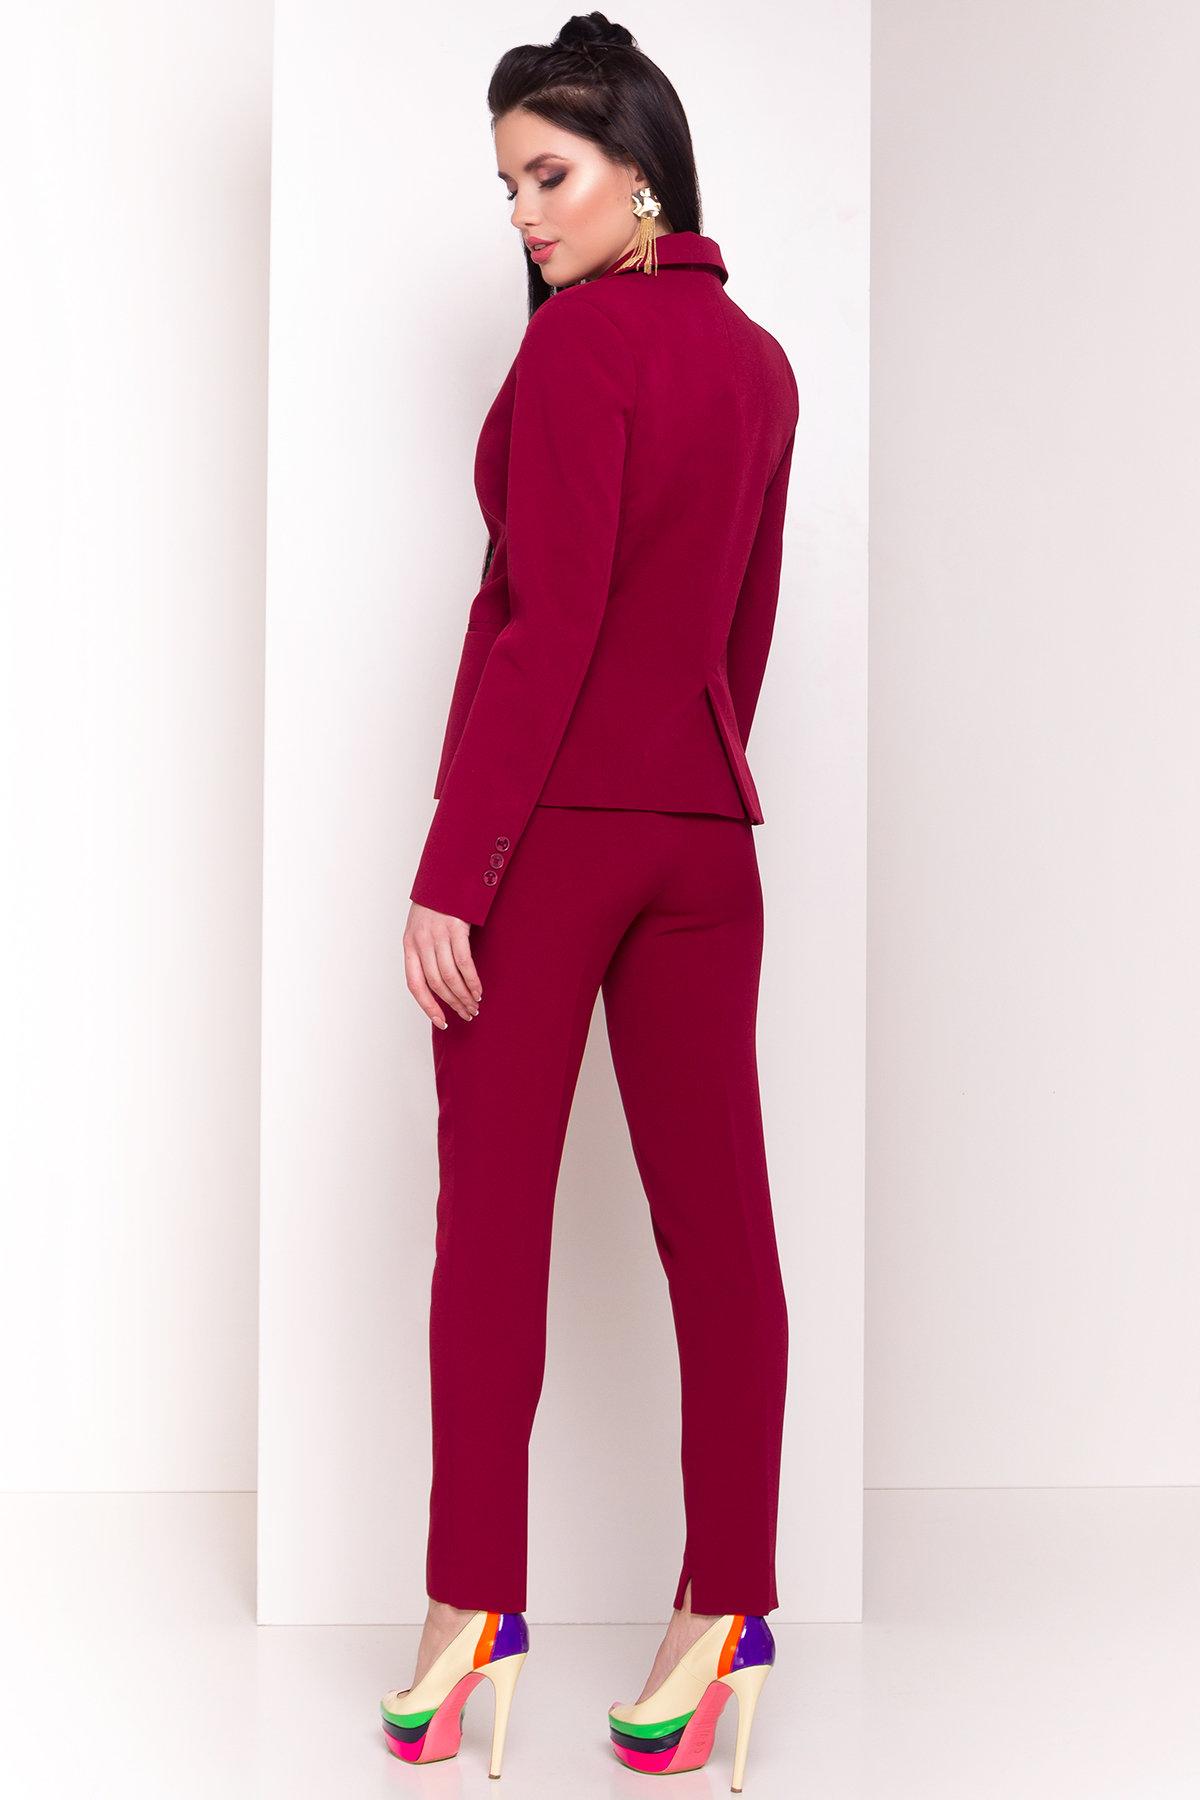 Жакет Эдвин 2734 АРТ. 33820 Цвет: Марсала - фото 3, интернет магазин tm-modus.ru